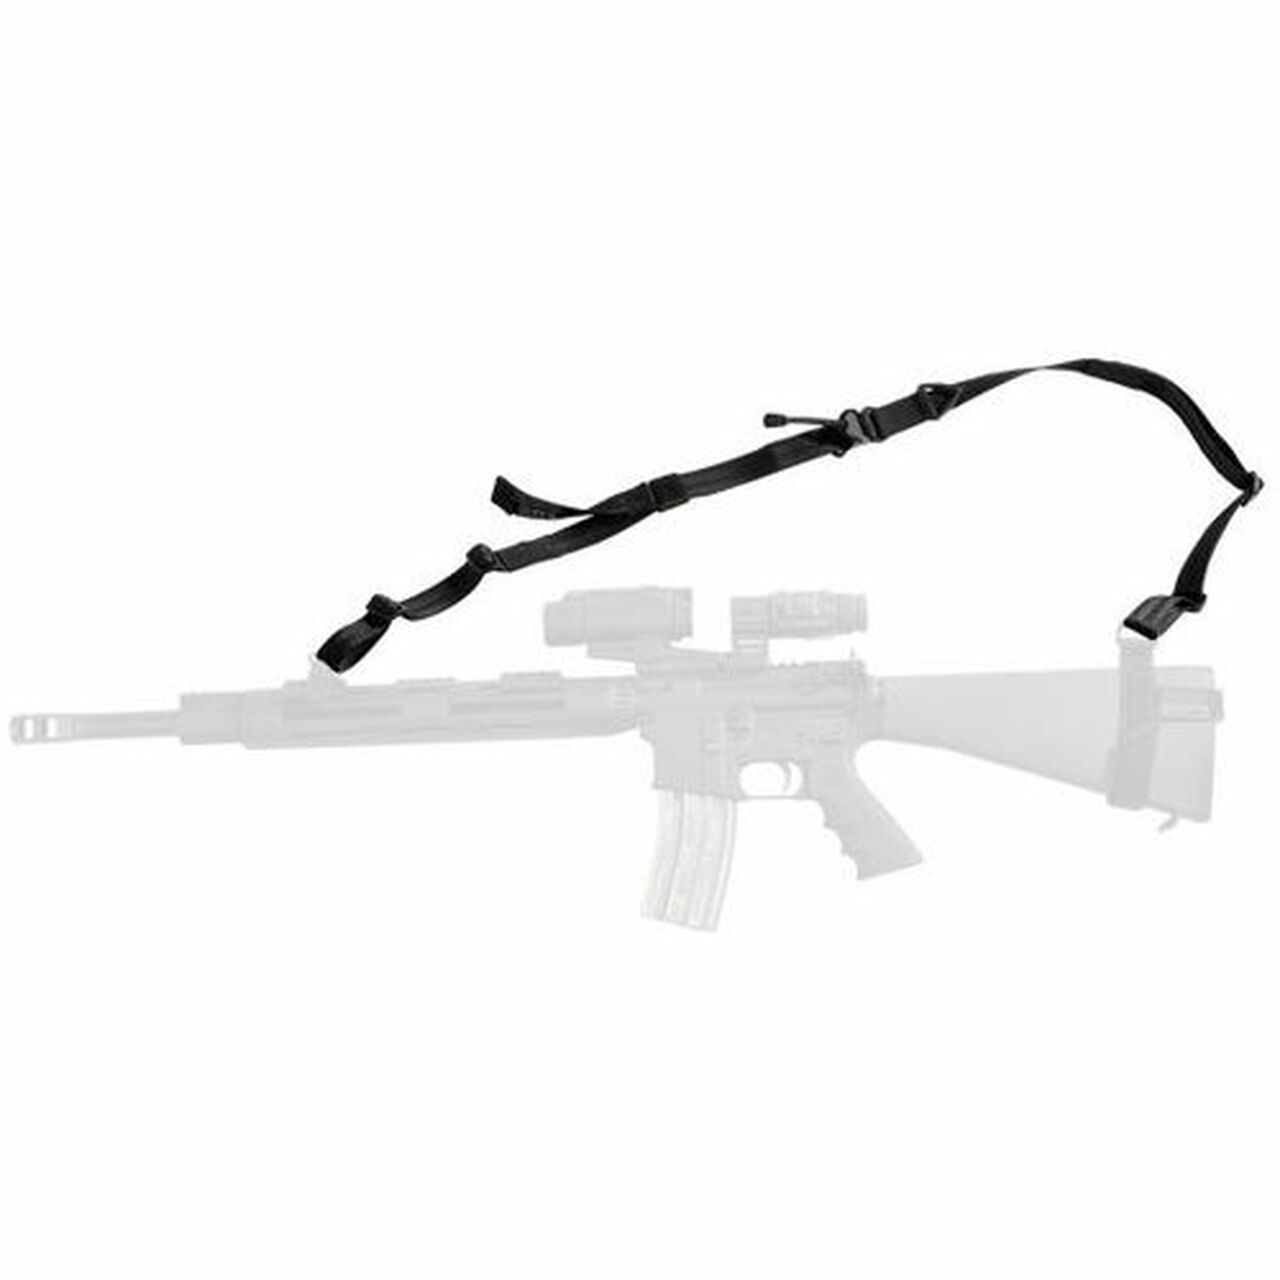 5.11 Tactical VTAC 2 Point Sling, available in Black or Sandstone 59120